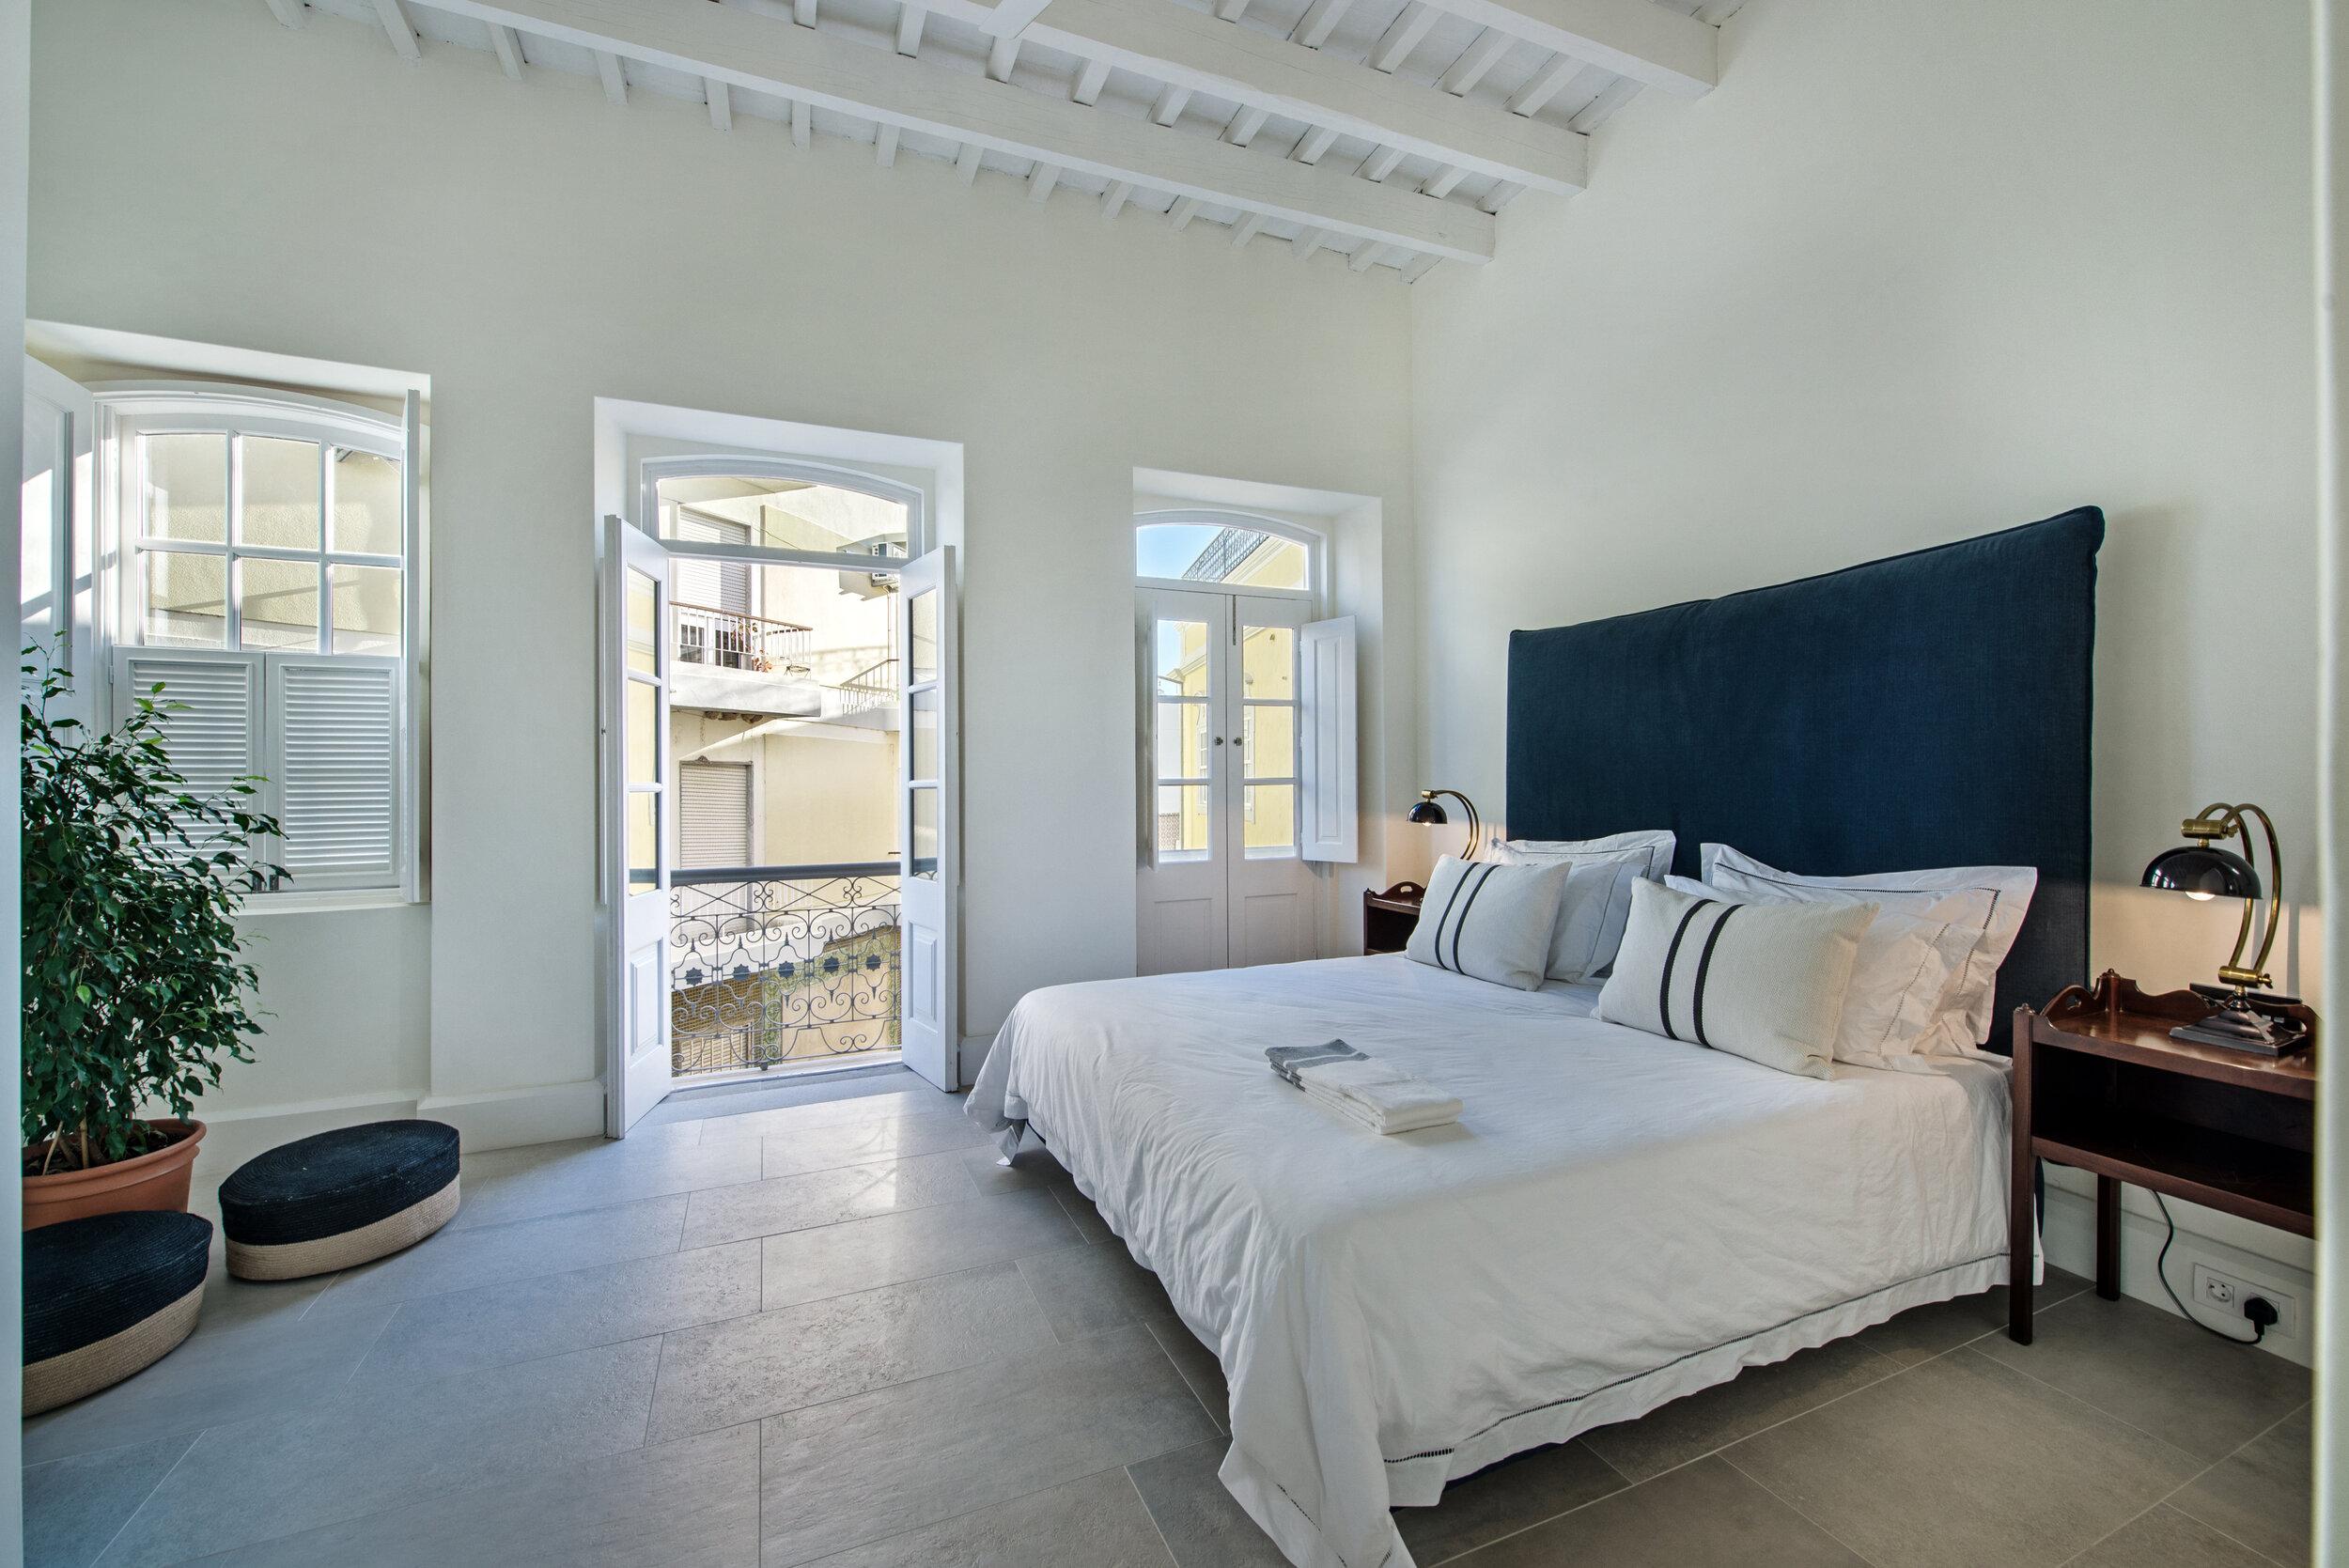 the Gallery suite - Casa Fuzetta (25).jpg